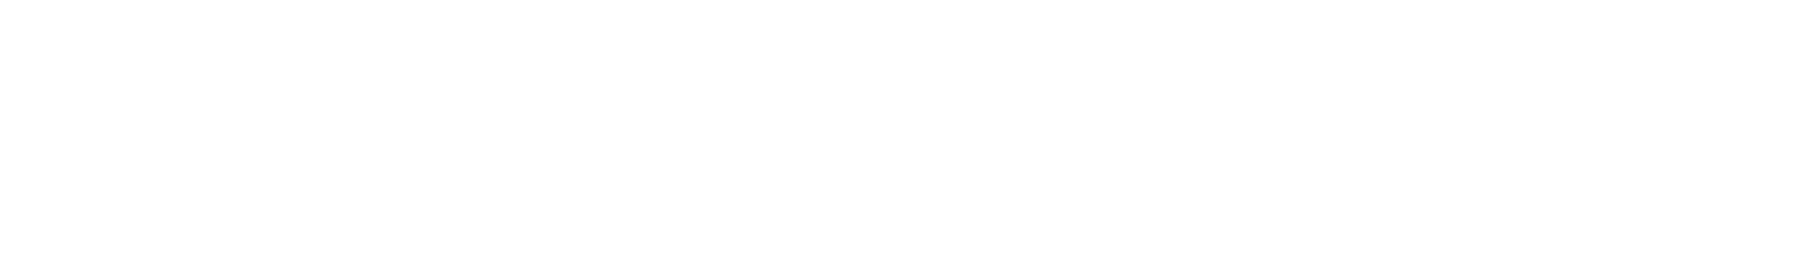 3 online audio converter.com